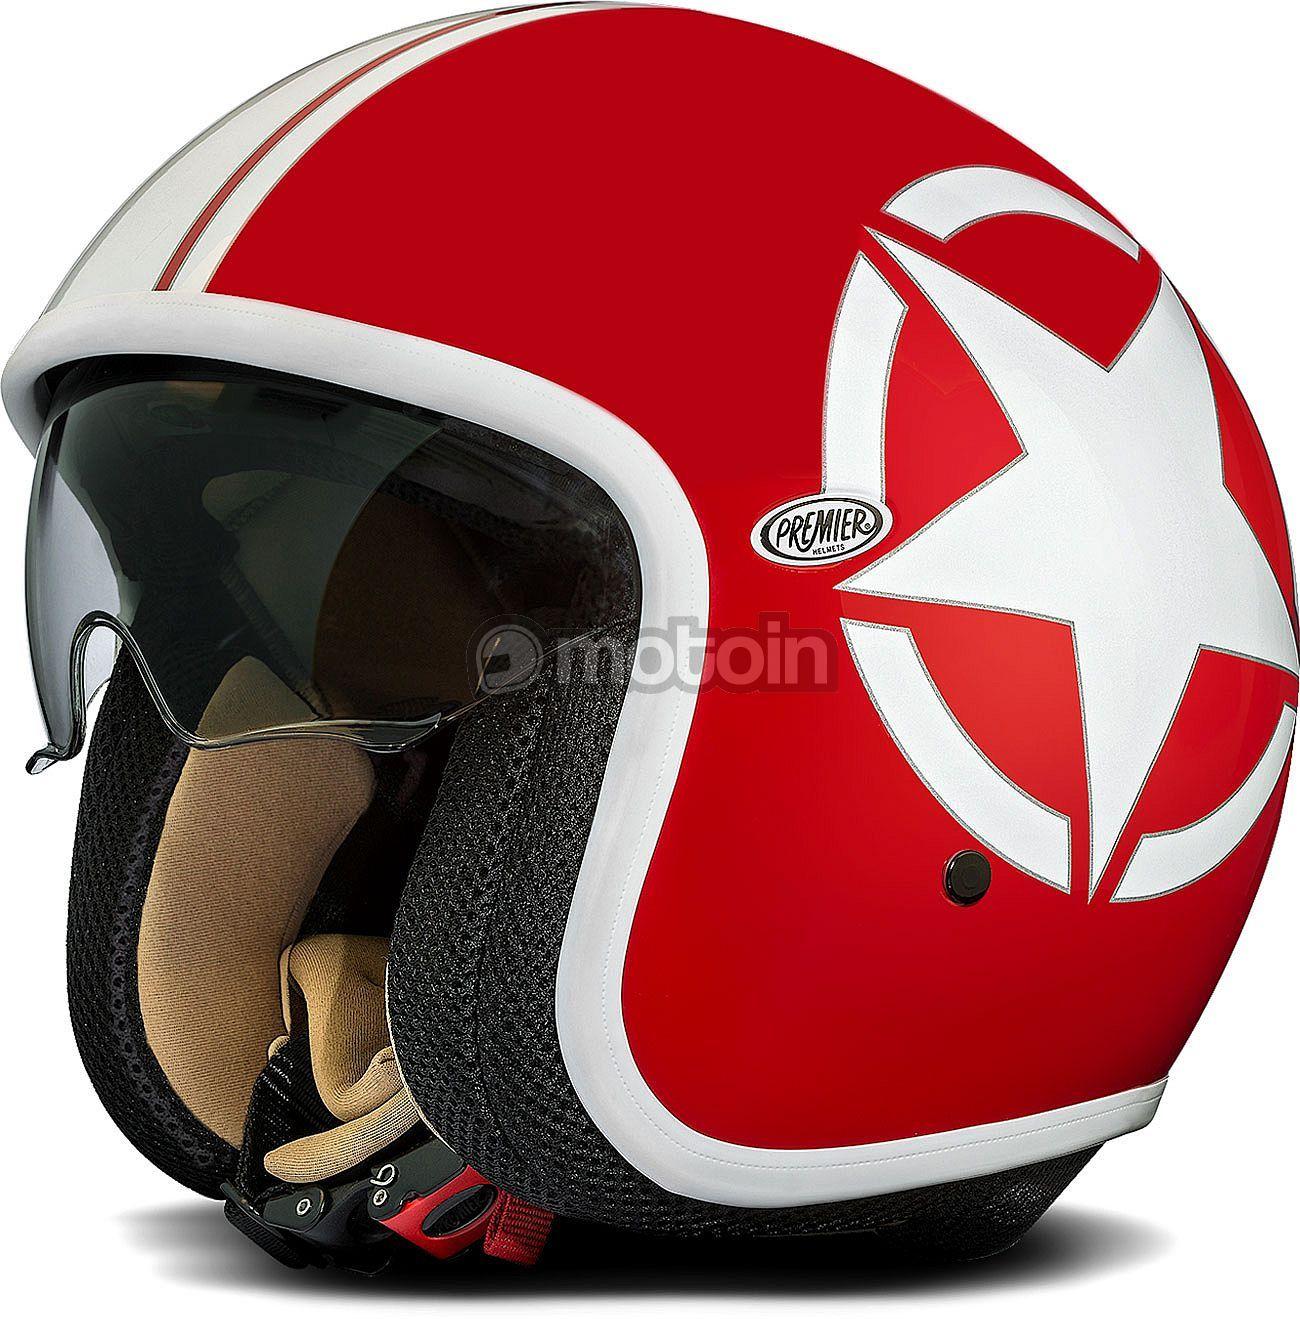 Premier Vintage Star Jet Helmet Custom Motorcycle Helmets Retro Motorcycle Helmets Helmet